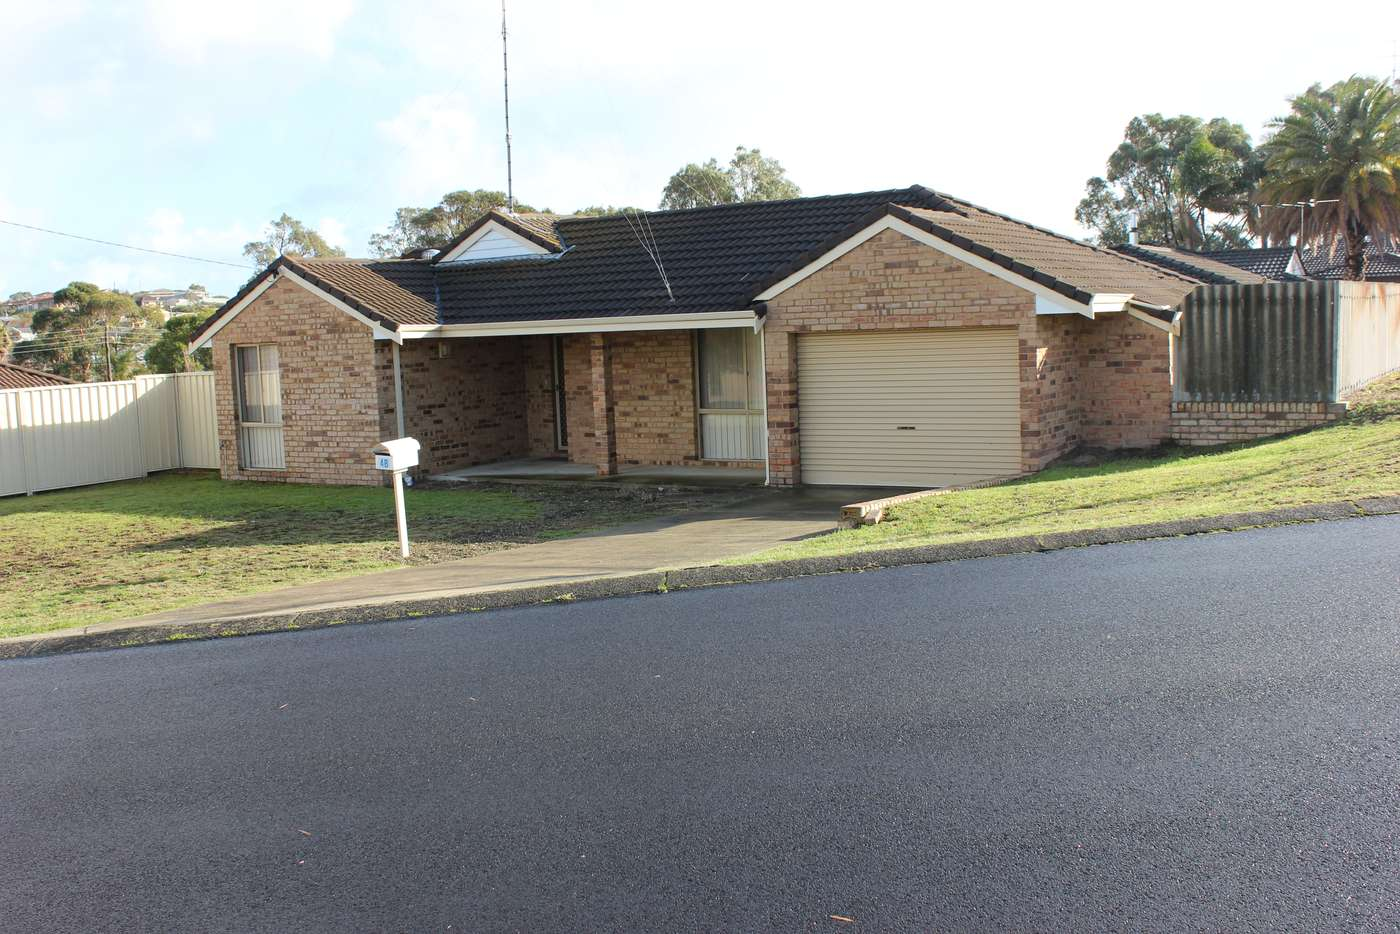 Main view of Homely house listing, 4B Kilmartin Place, Usher WA 6230